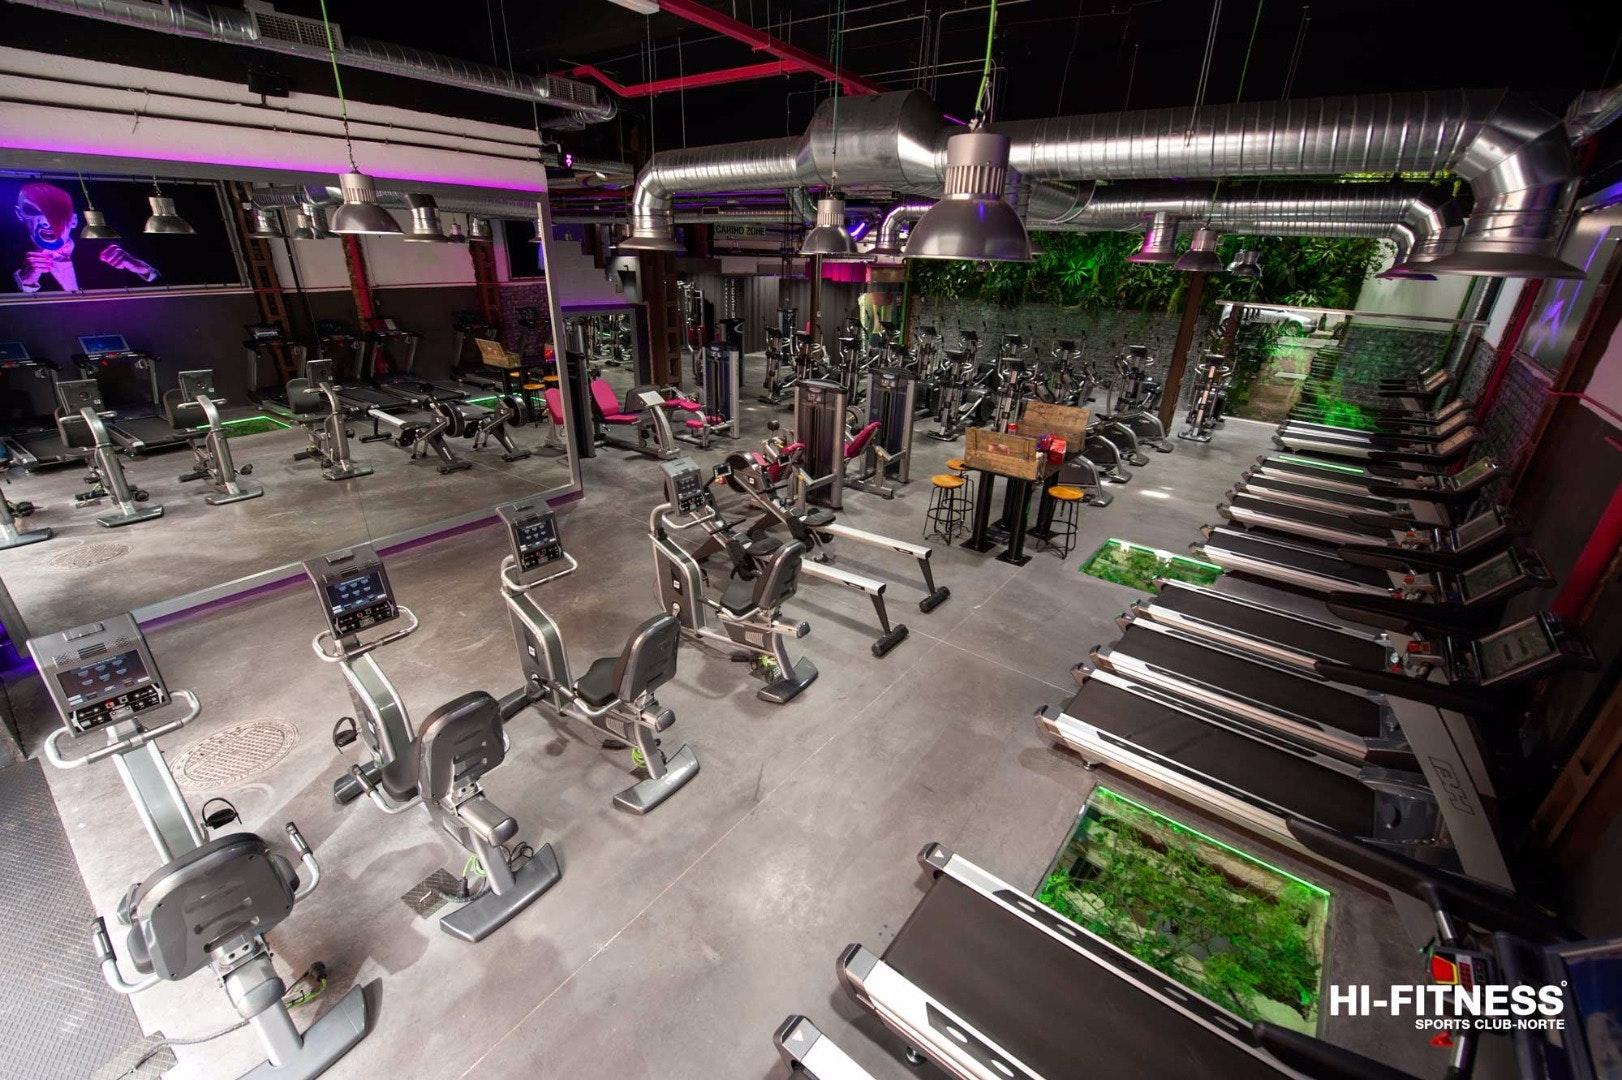 Foto 0 Oferta Gimnasio Hi fitness Norte Madrid - GymForLess